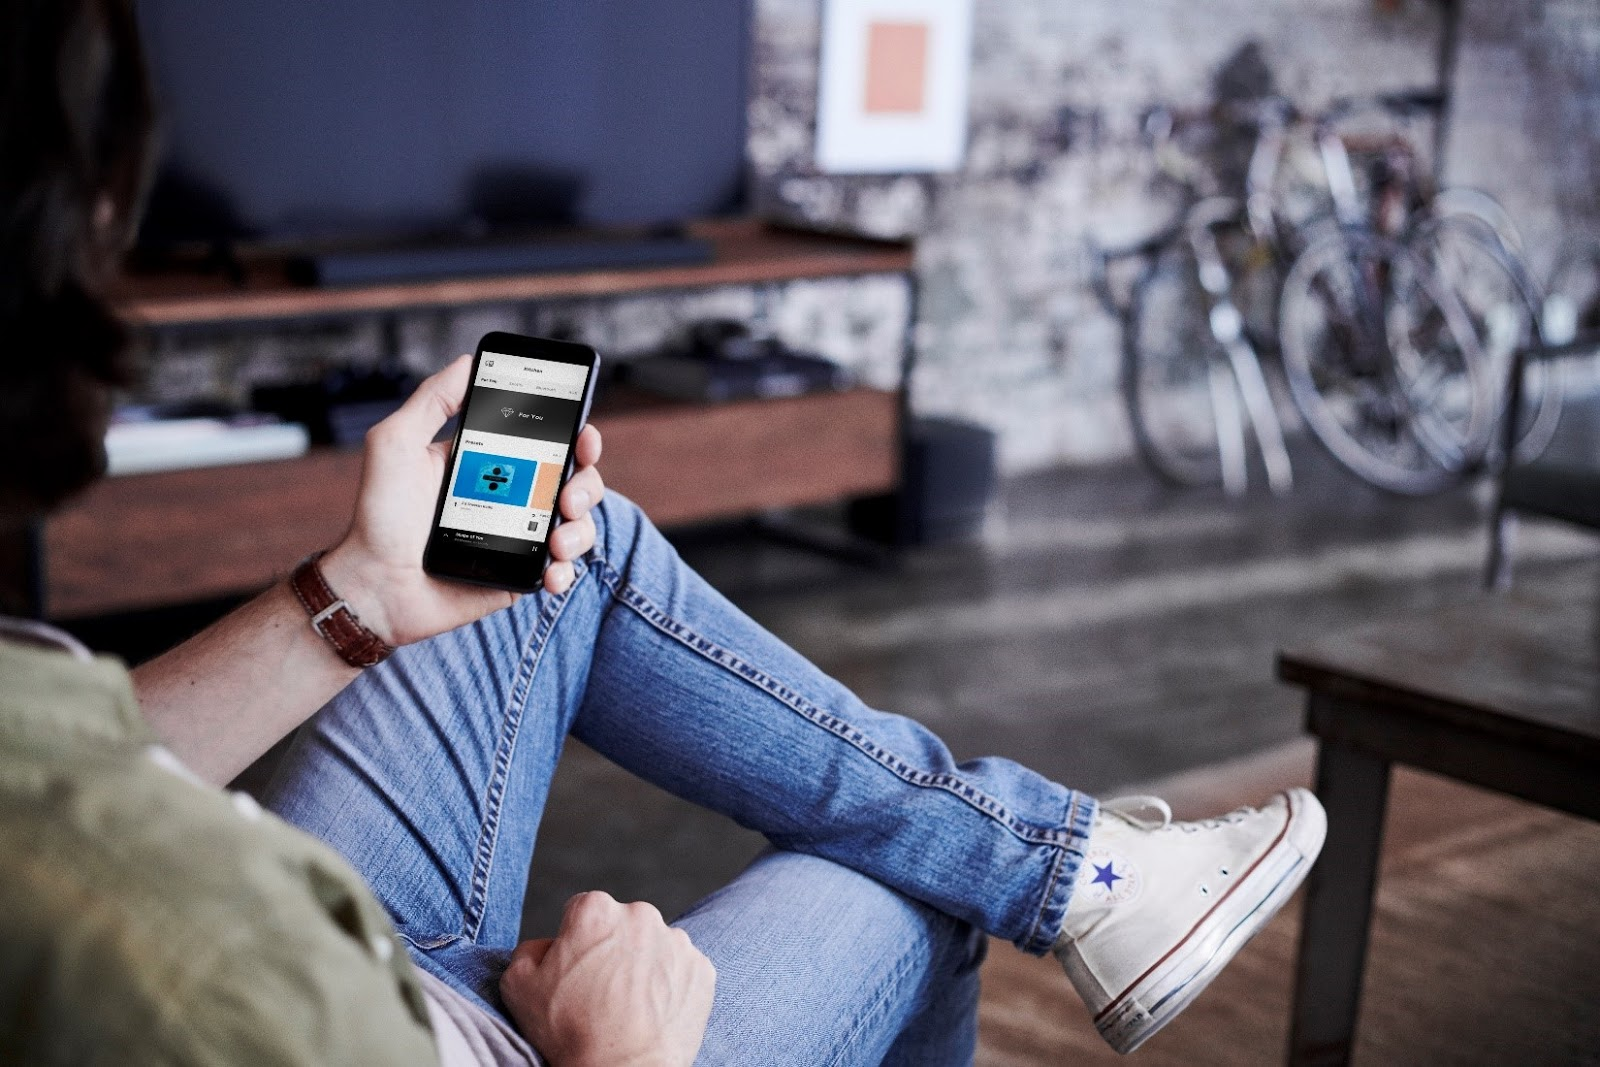 Bose Home Speaker System